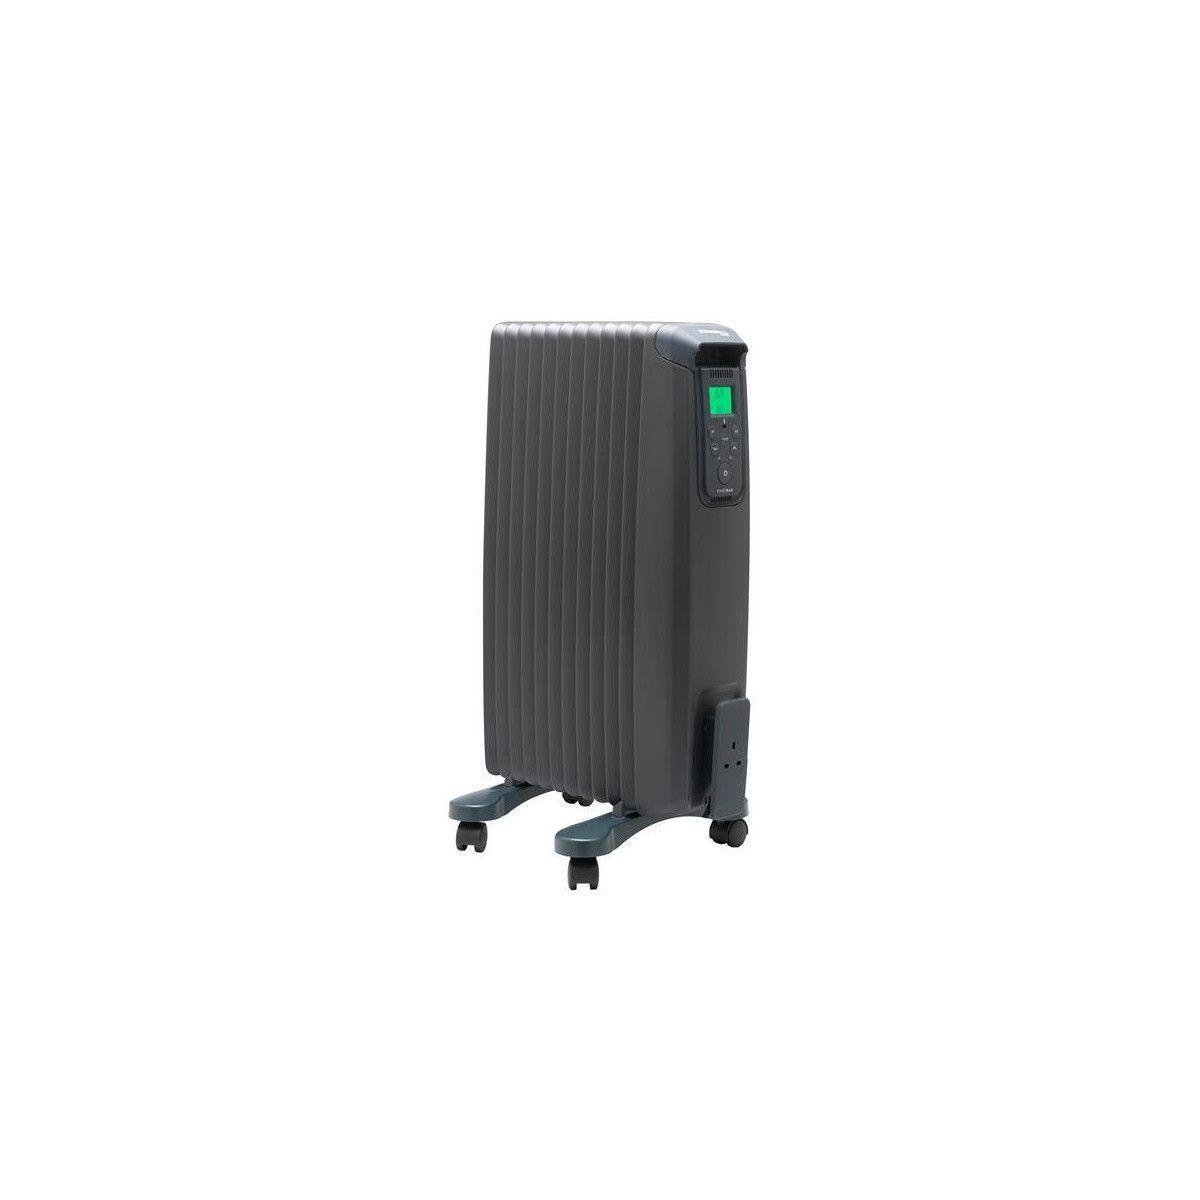 EWT Radiateur Electrique 1500w Convecteur/rayonnant 1500w Noir Ewt - Evorad15a